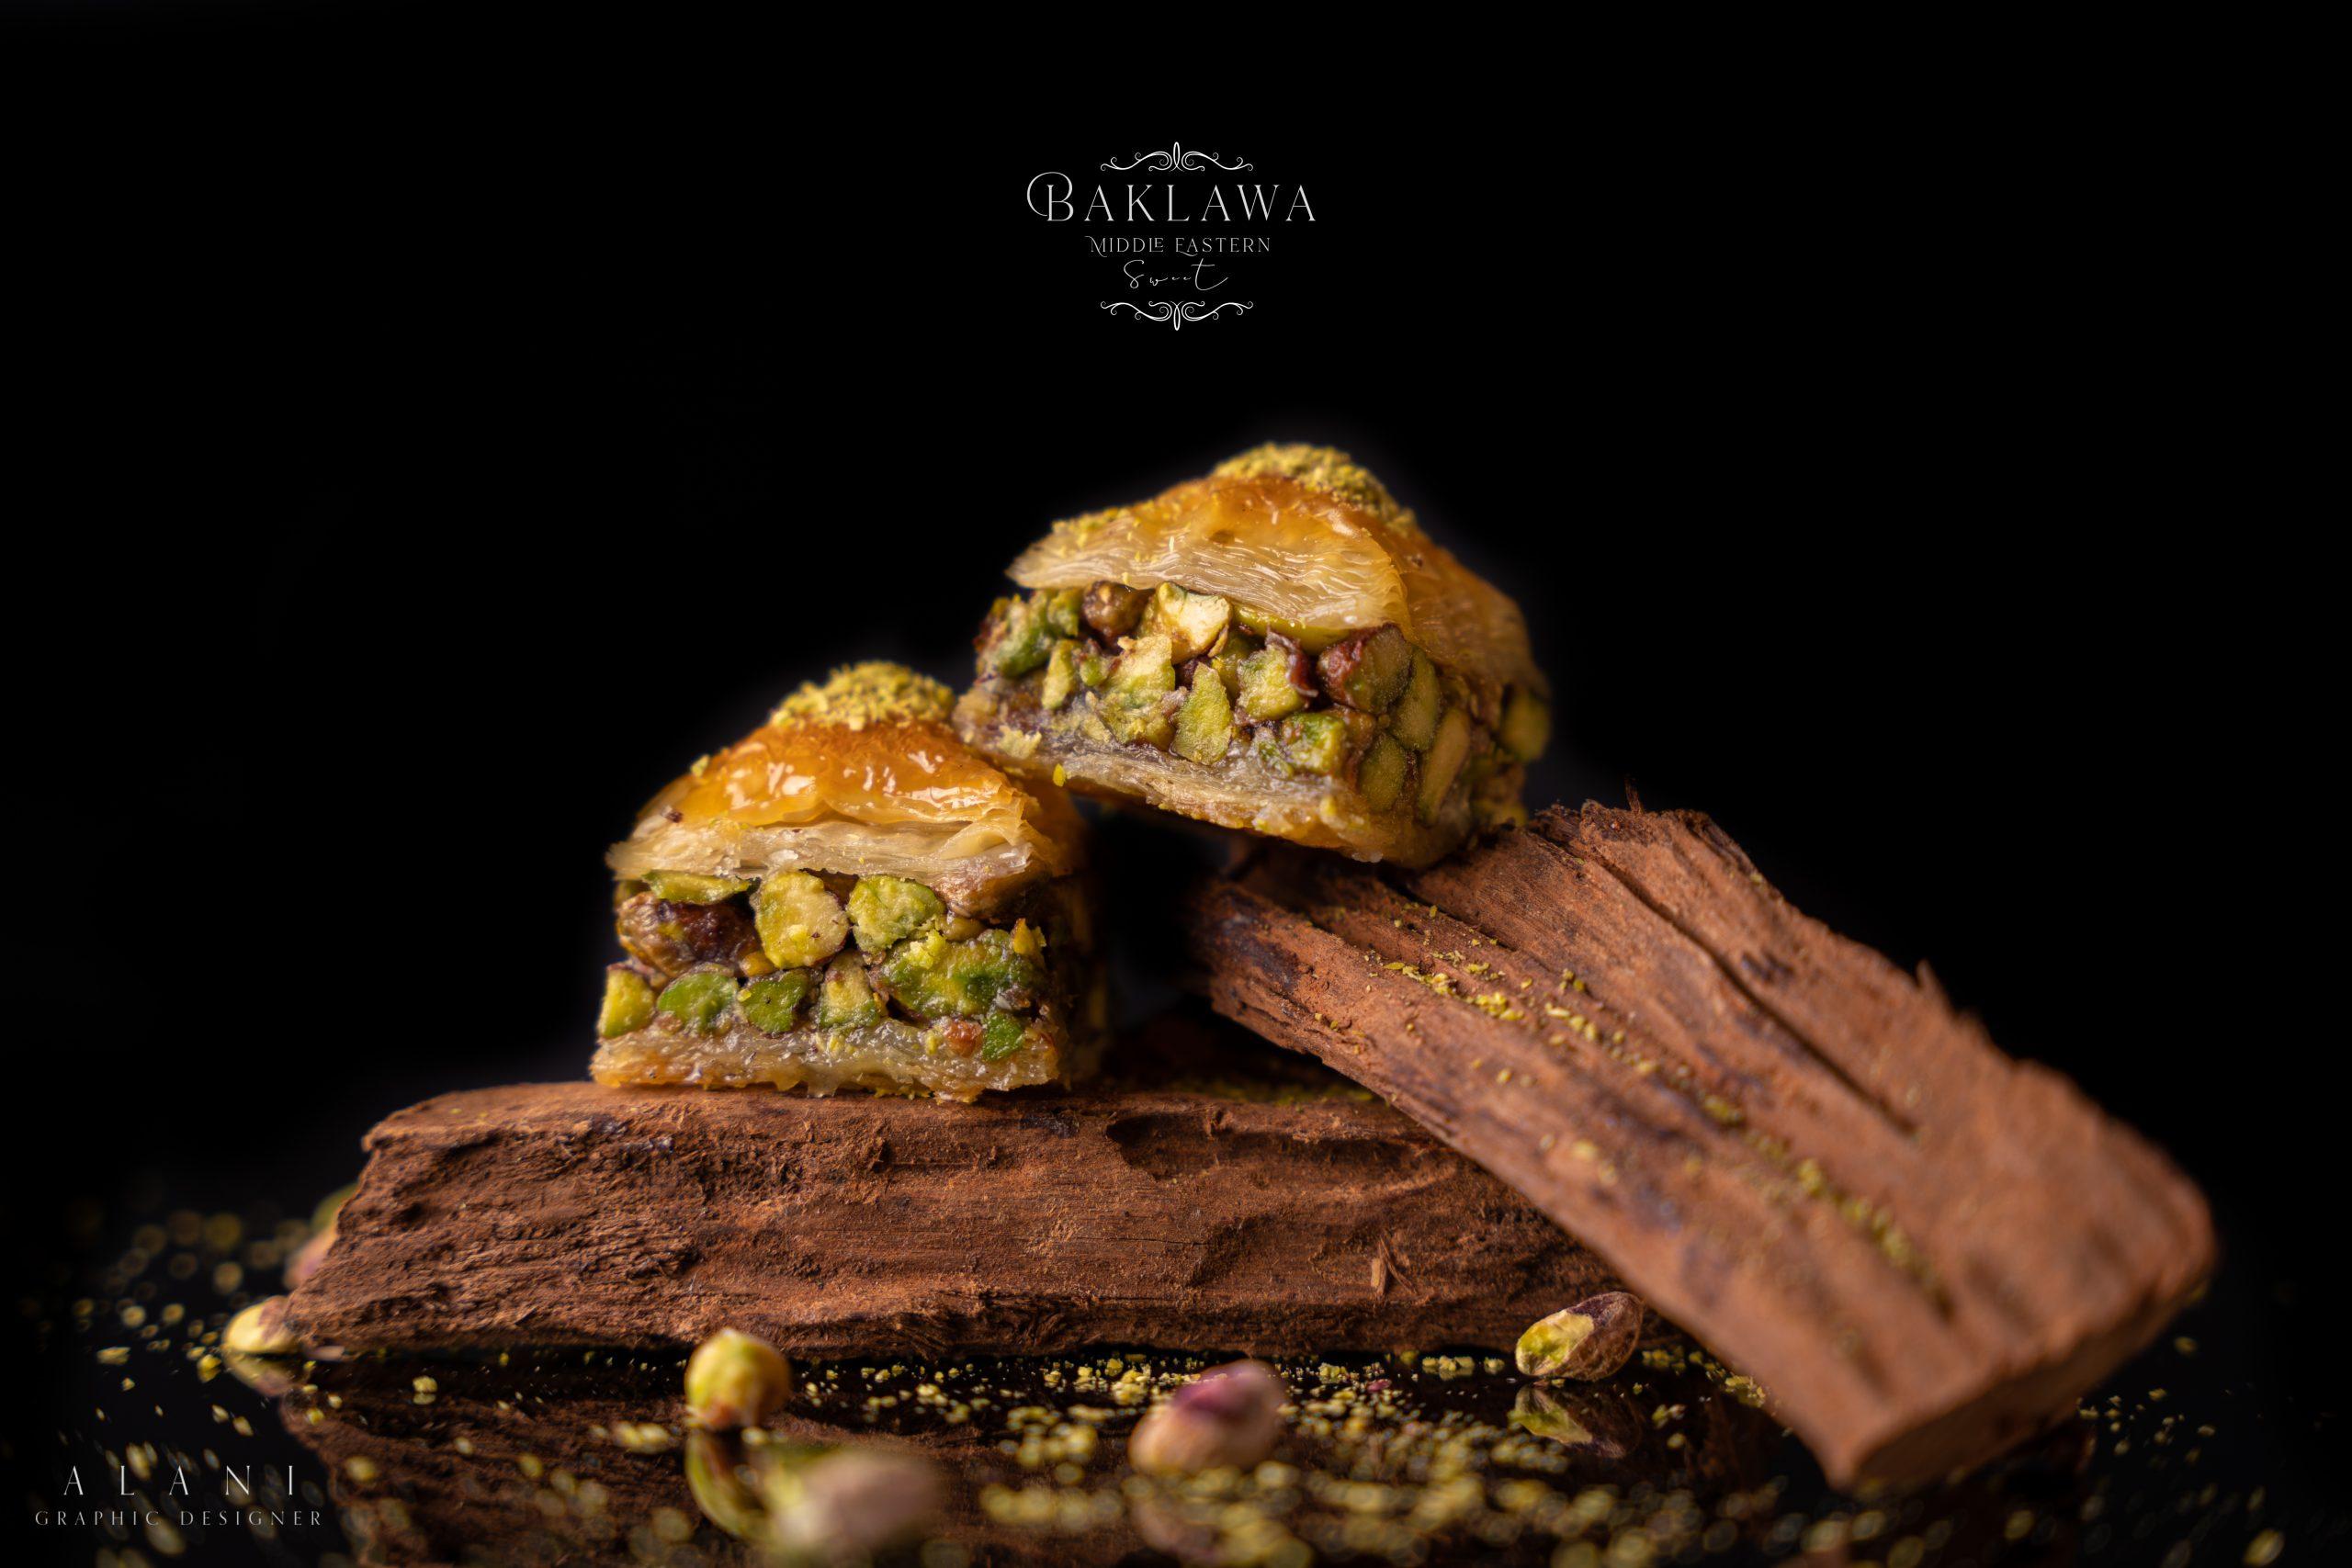 Sweet Photography for Mezza Restaurant